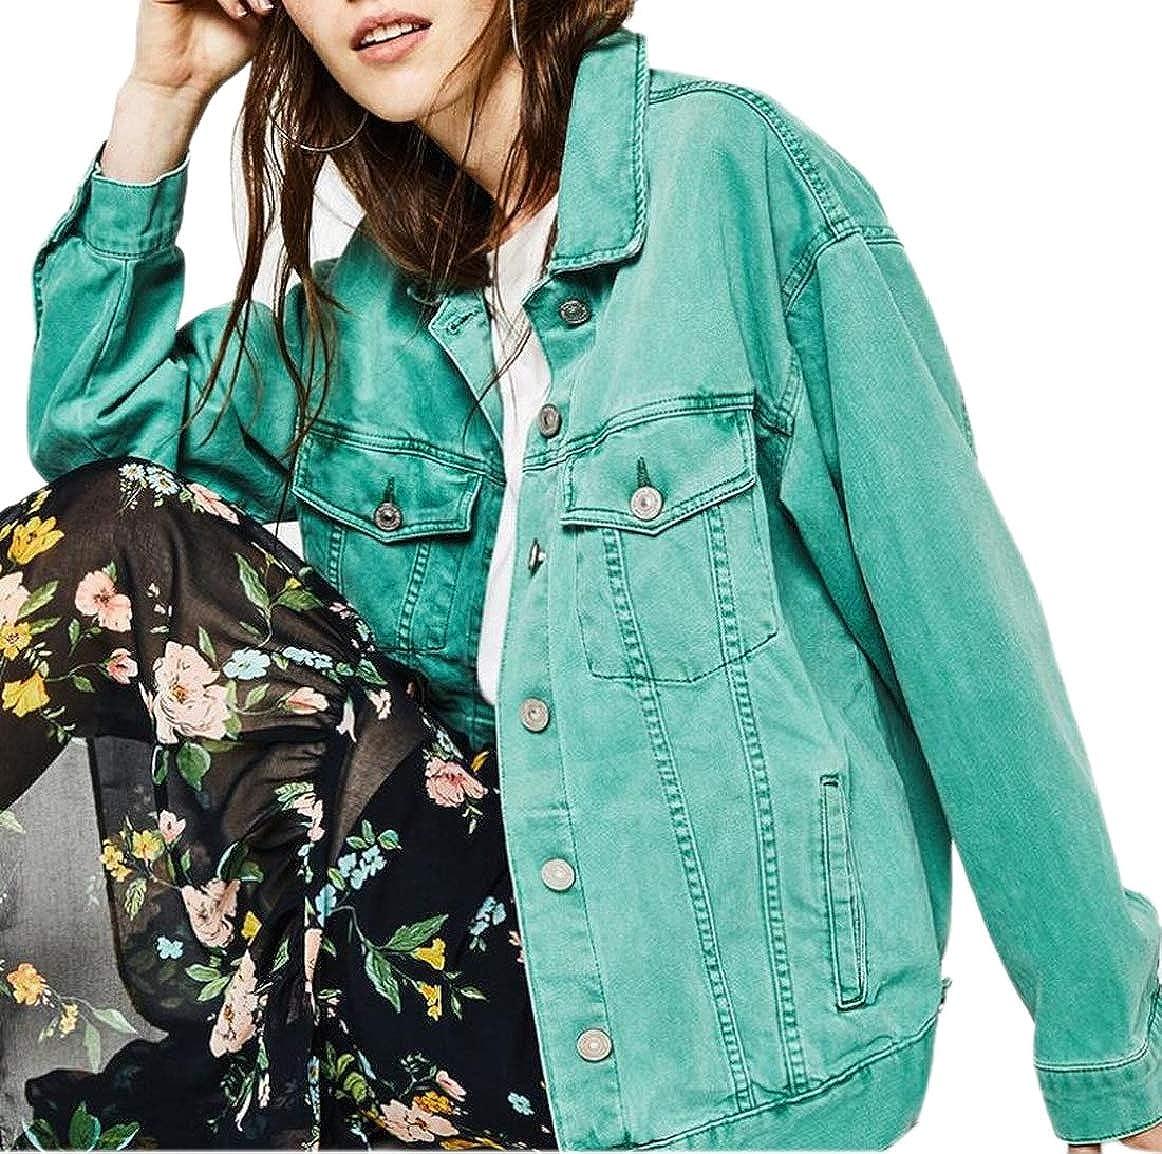 Green pujinggeCA Women Boyfriend Candy color Retro Loose Fit Coat Washed Denim Jacket